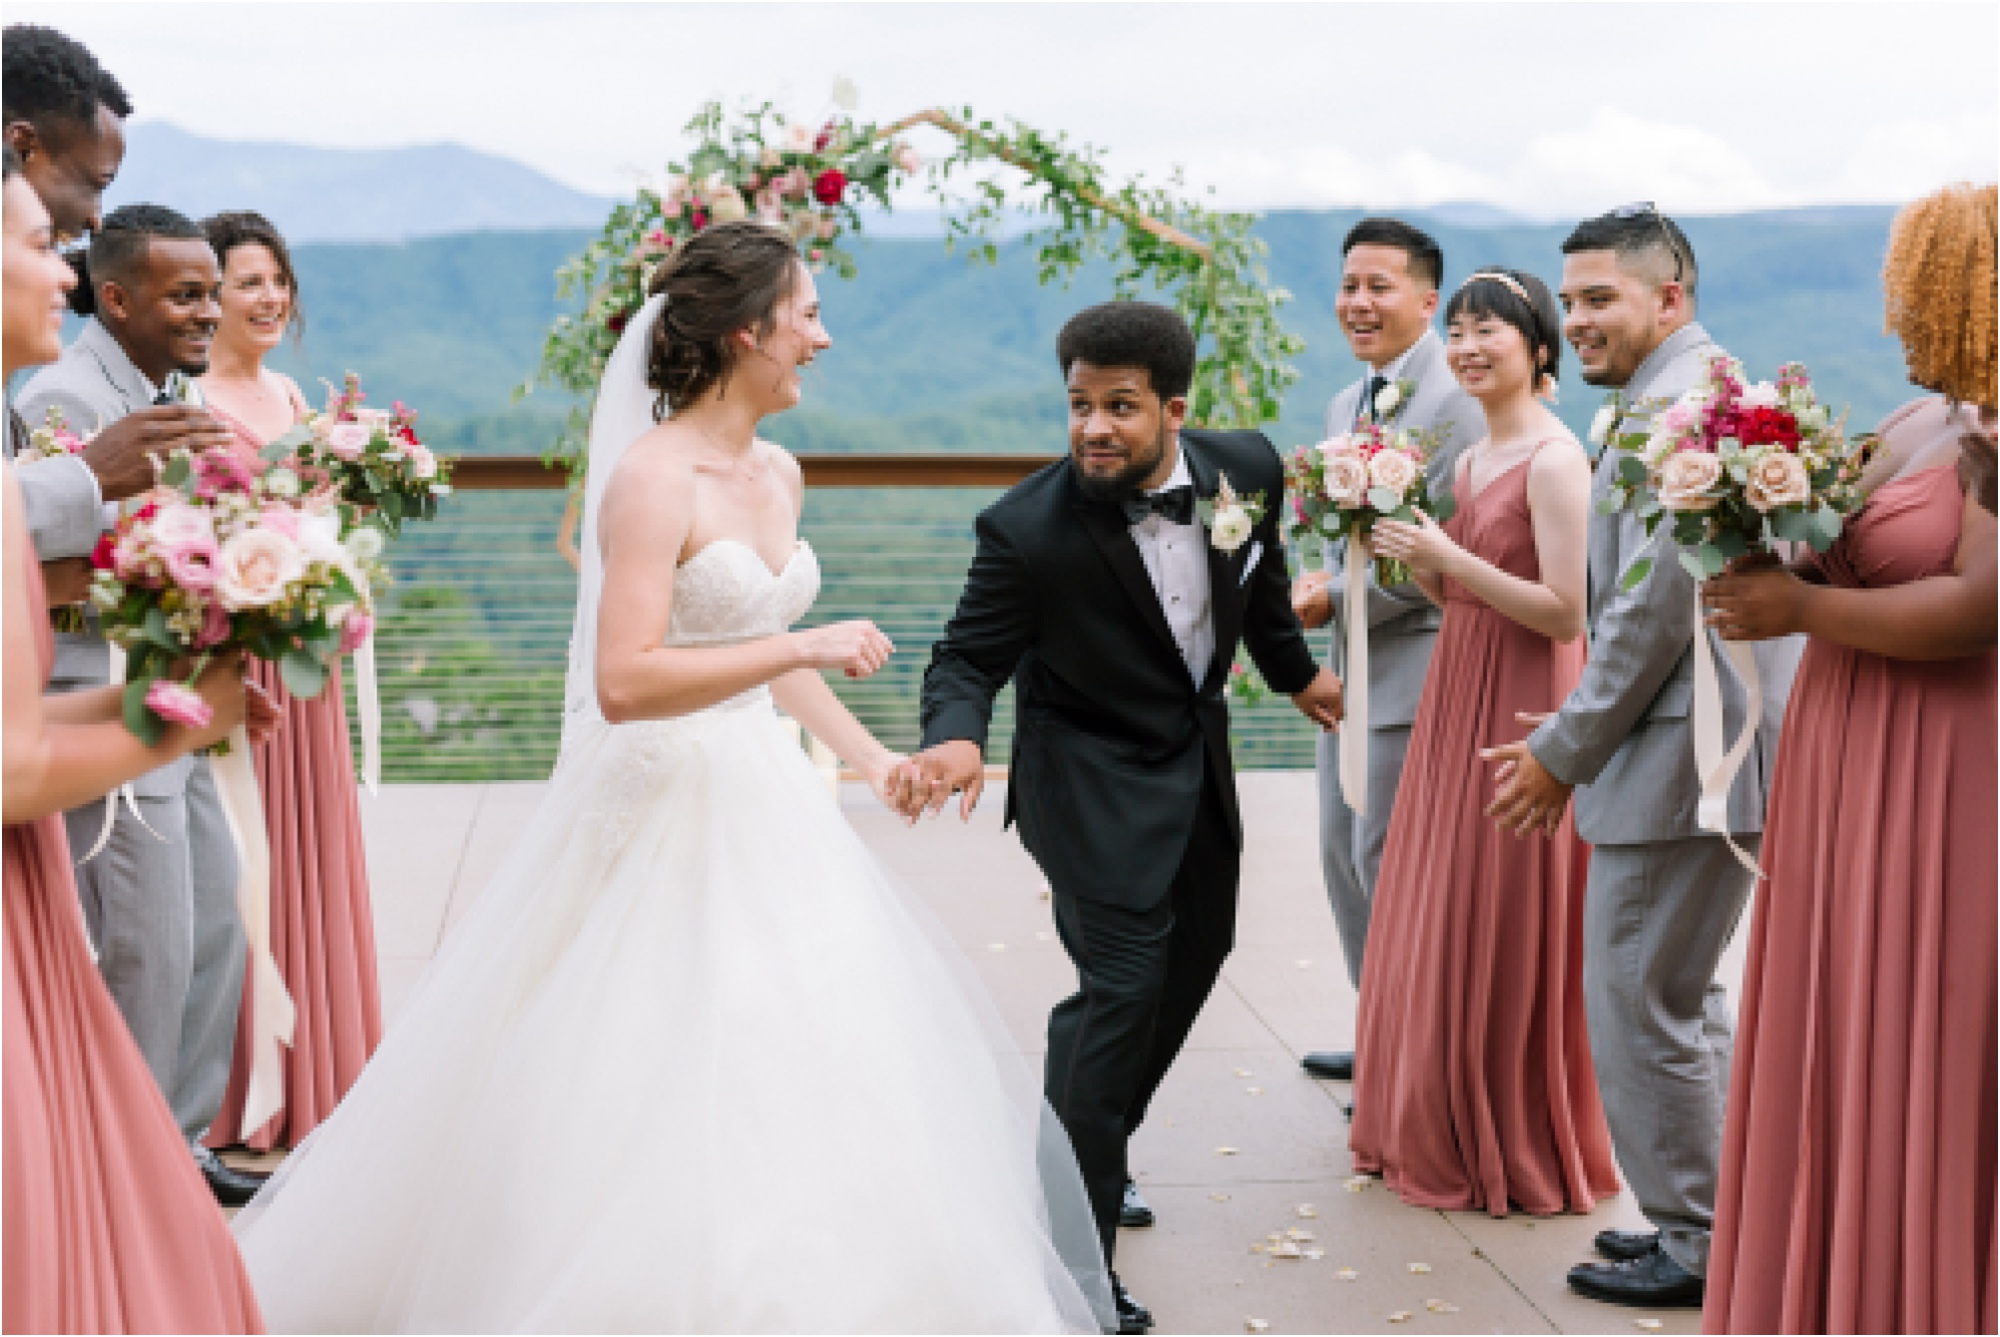 bride and groom walk between bridal party